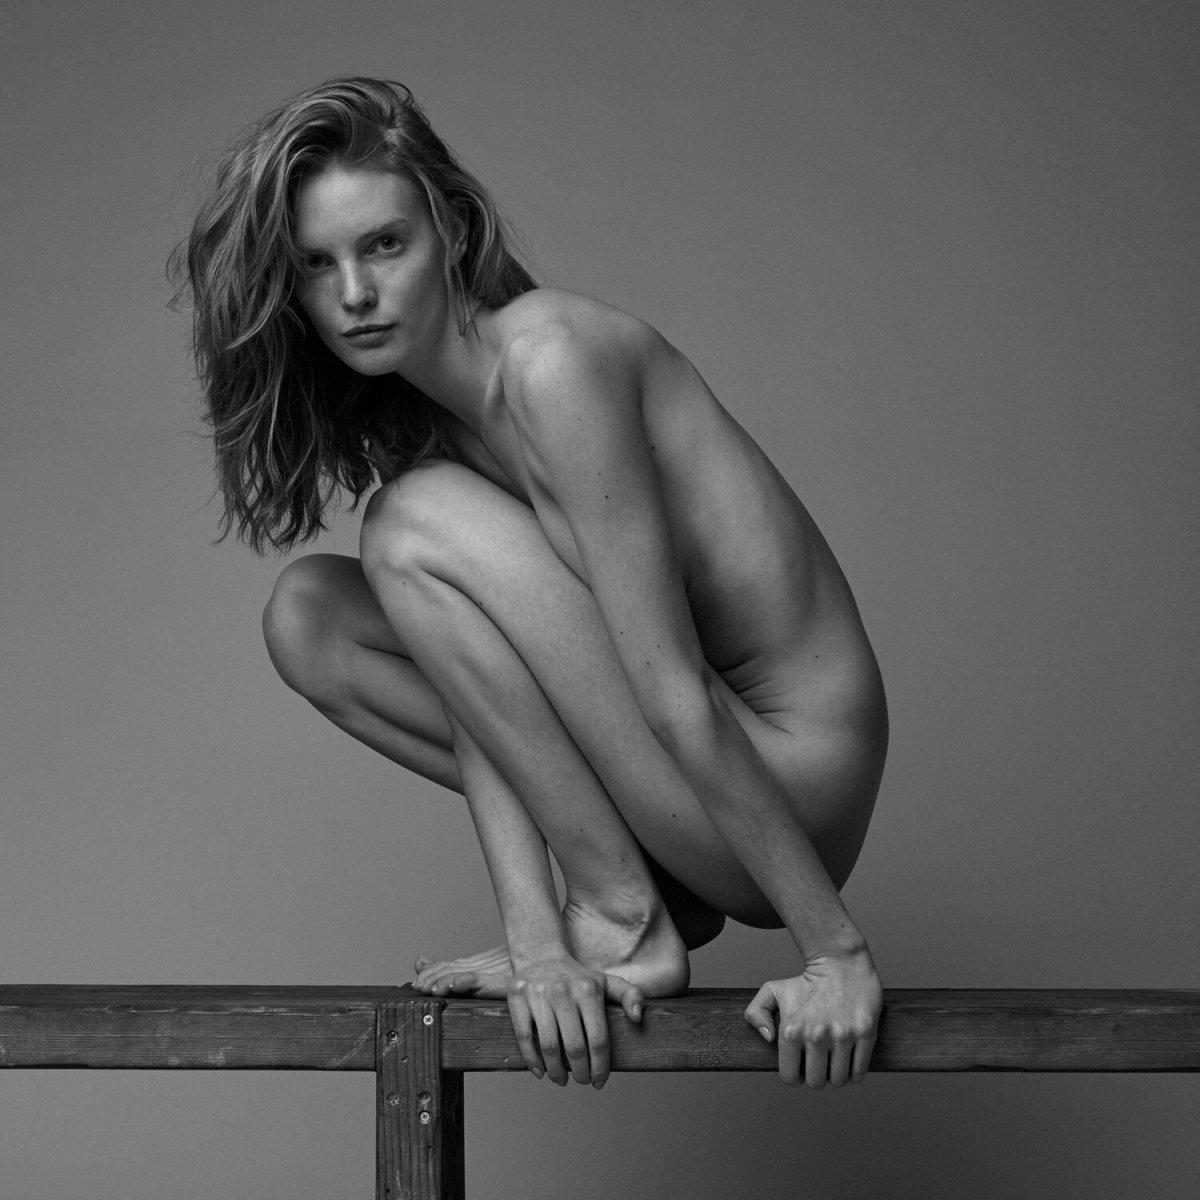 Clara Settje by Michal Rzepecki